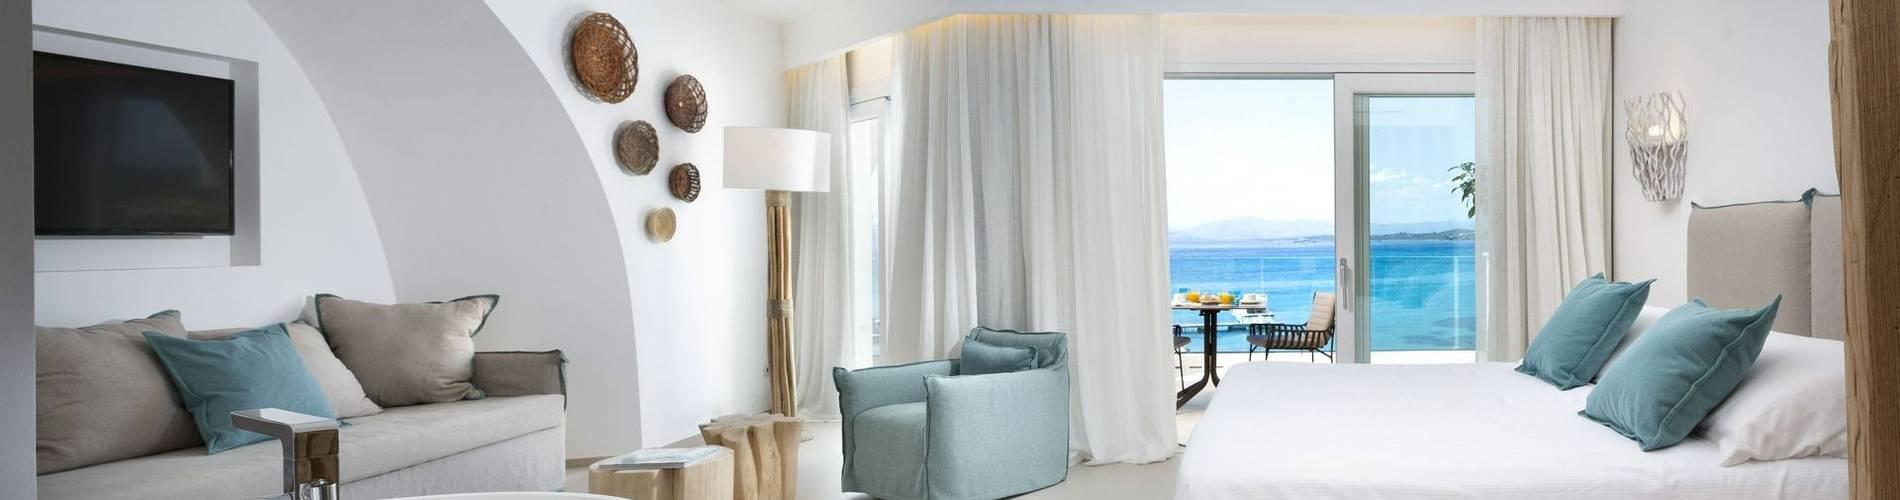 Pool Suite - Gabbiano Azzurro Hotel Sardinia1.jpg